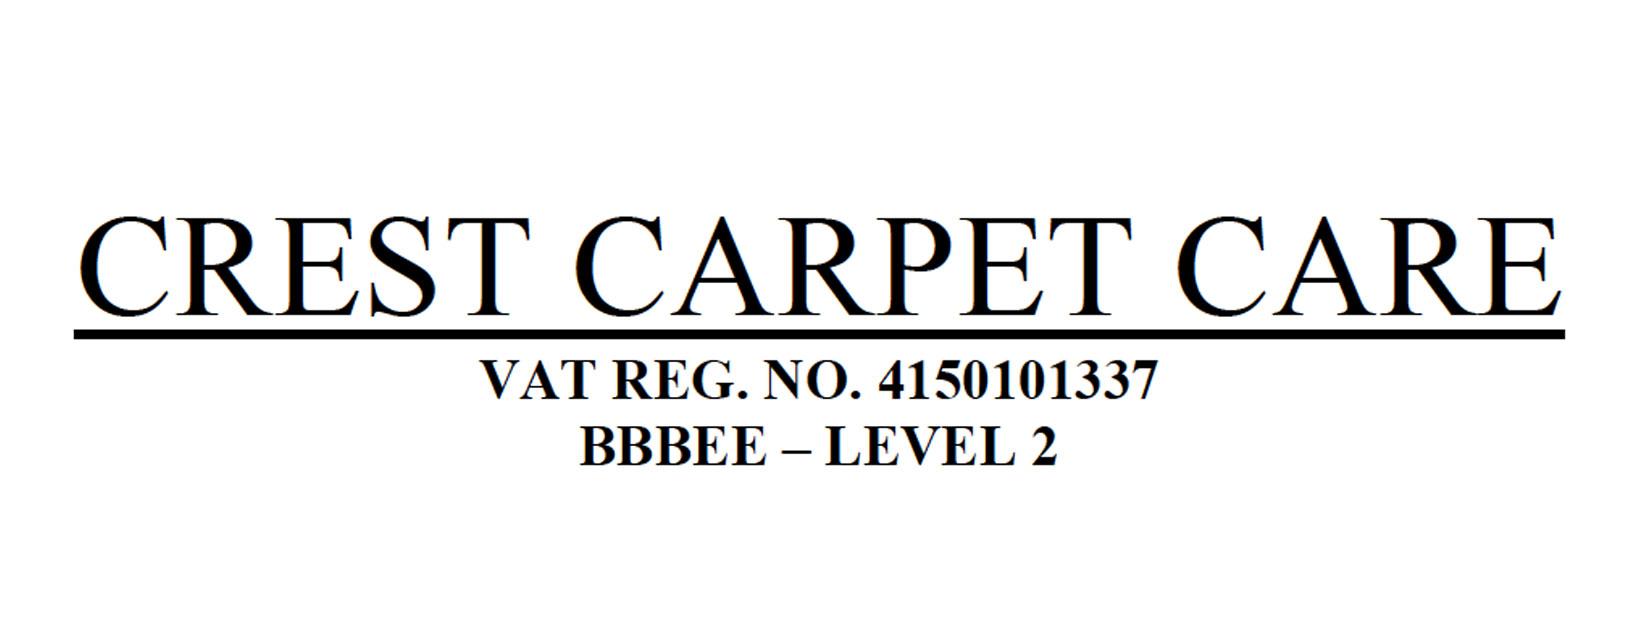 crest carpet care logo